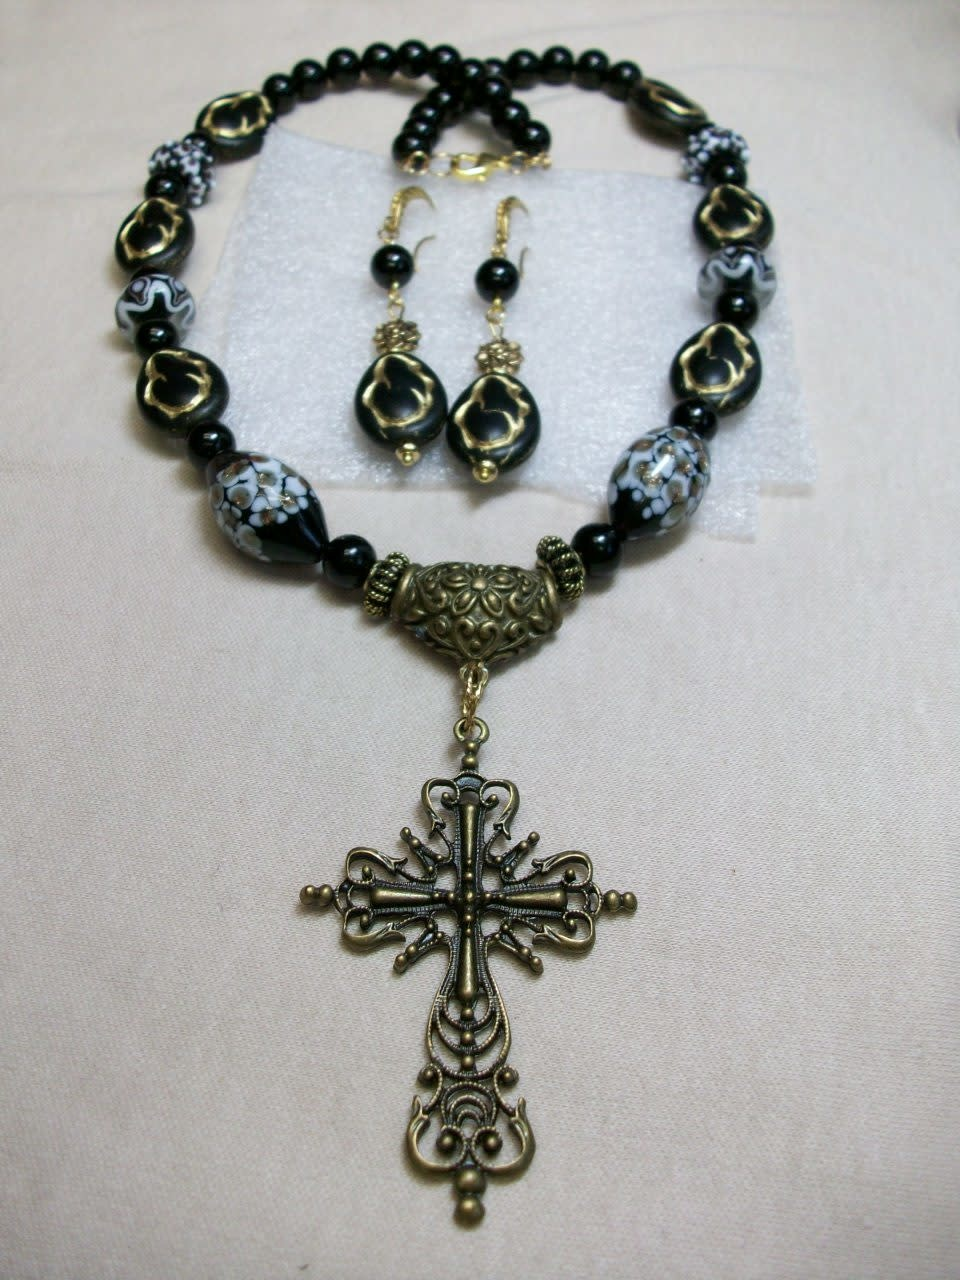 Sharon B's Originals Antique Gold Gothic Cross w/ Black Madonna Beads Necklace & Earring Set